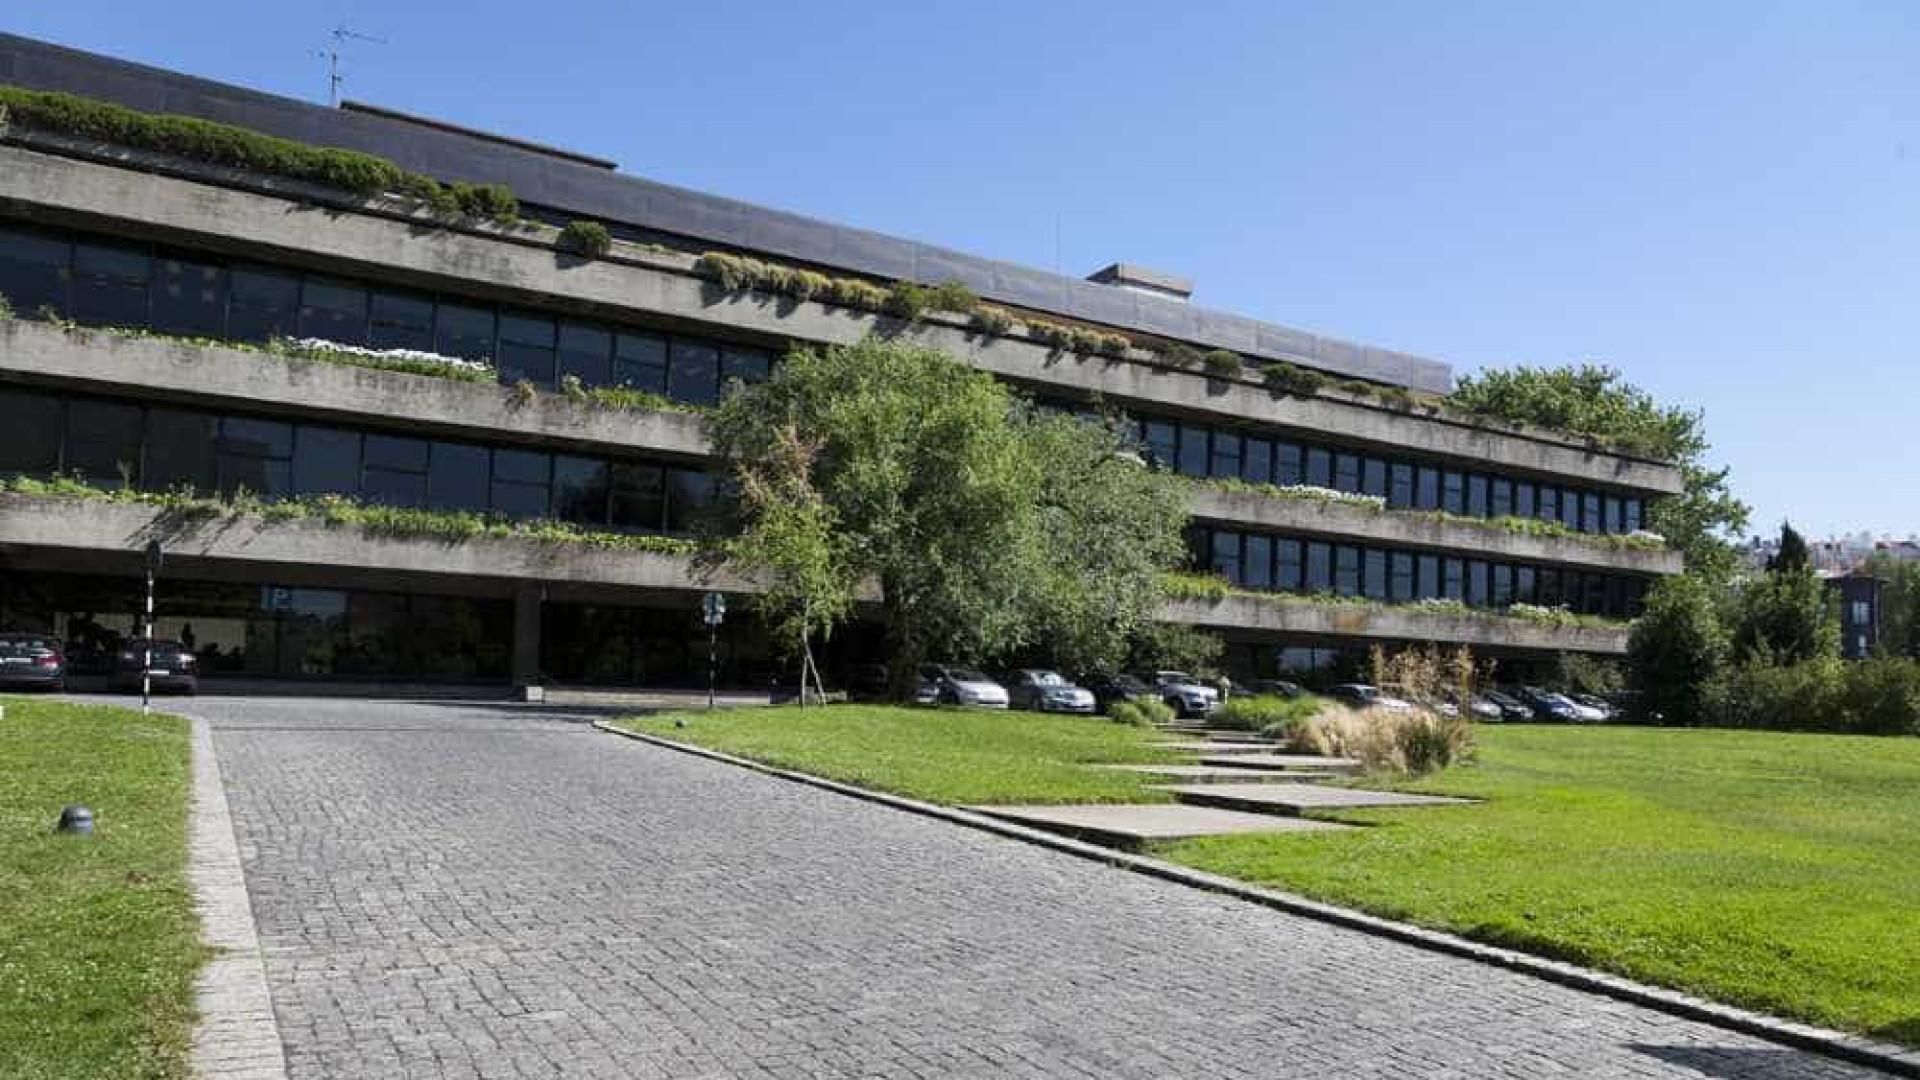 Fundação Calouste Gulbenkian adere à plataforma Future Architecture